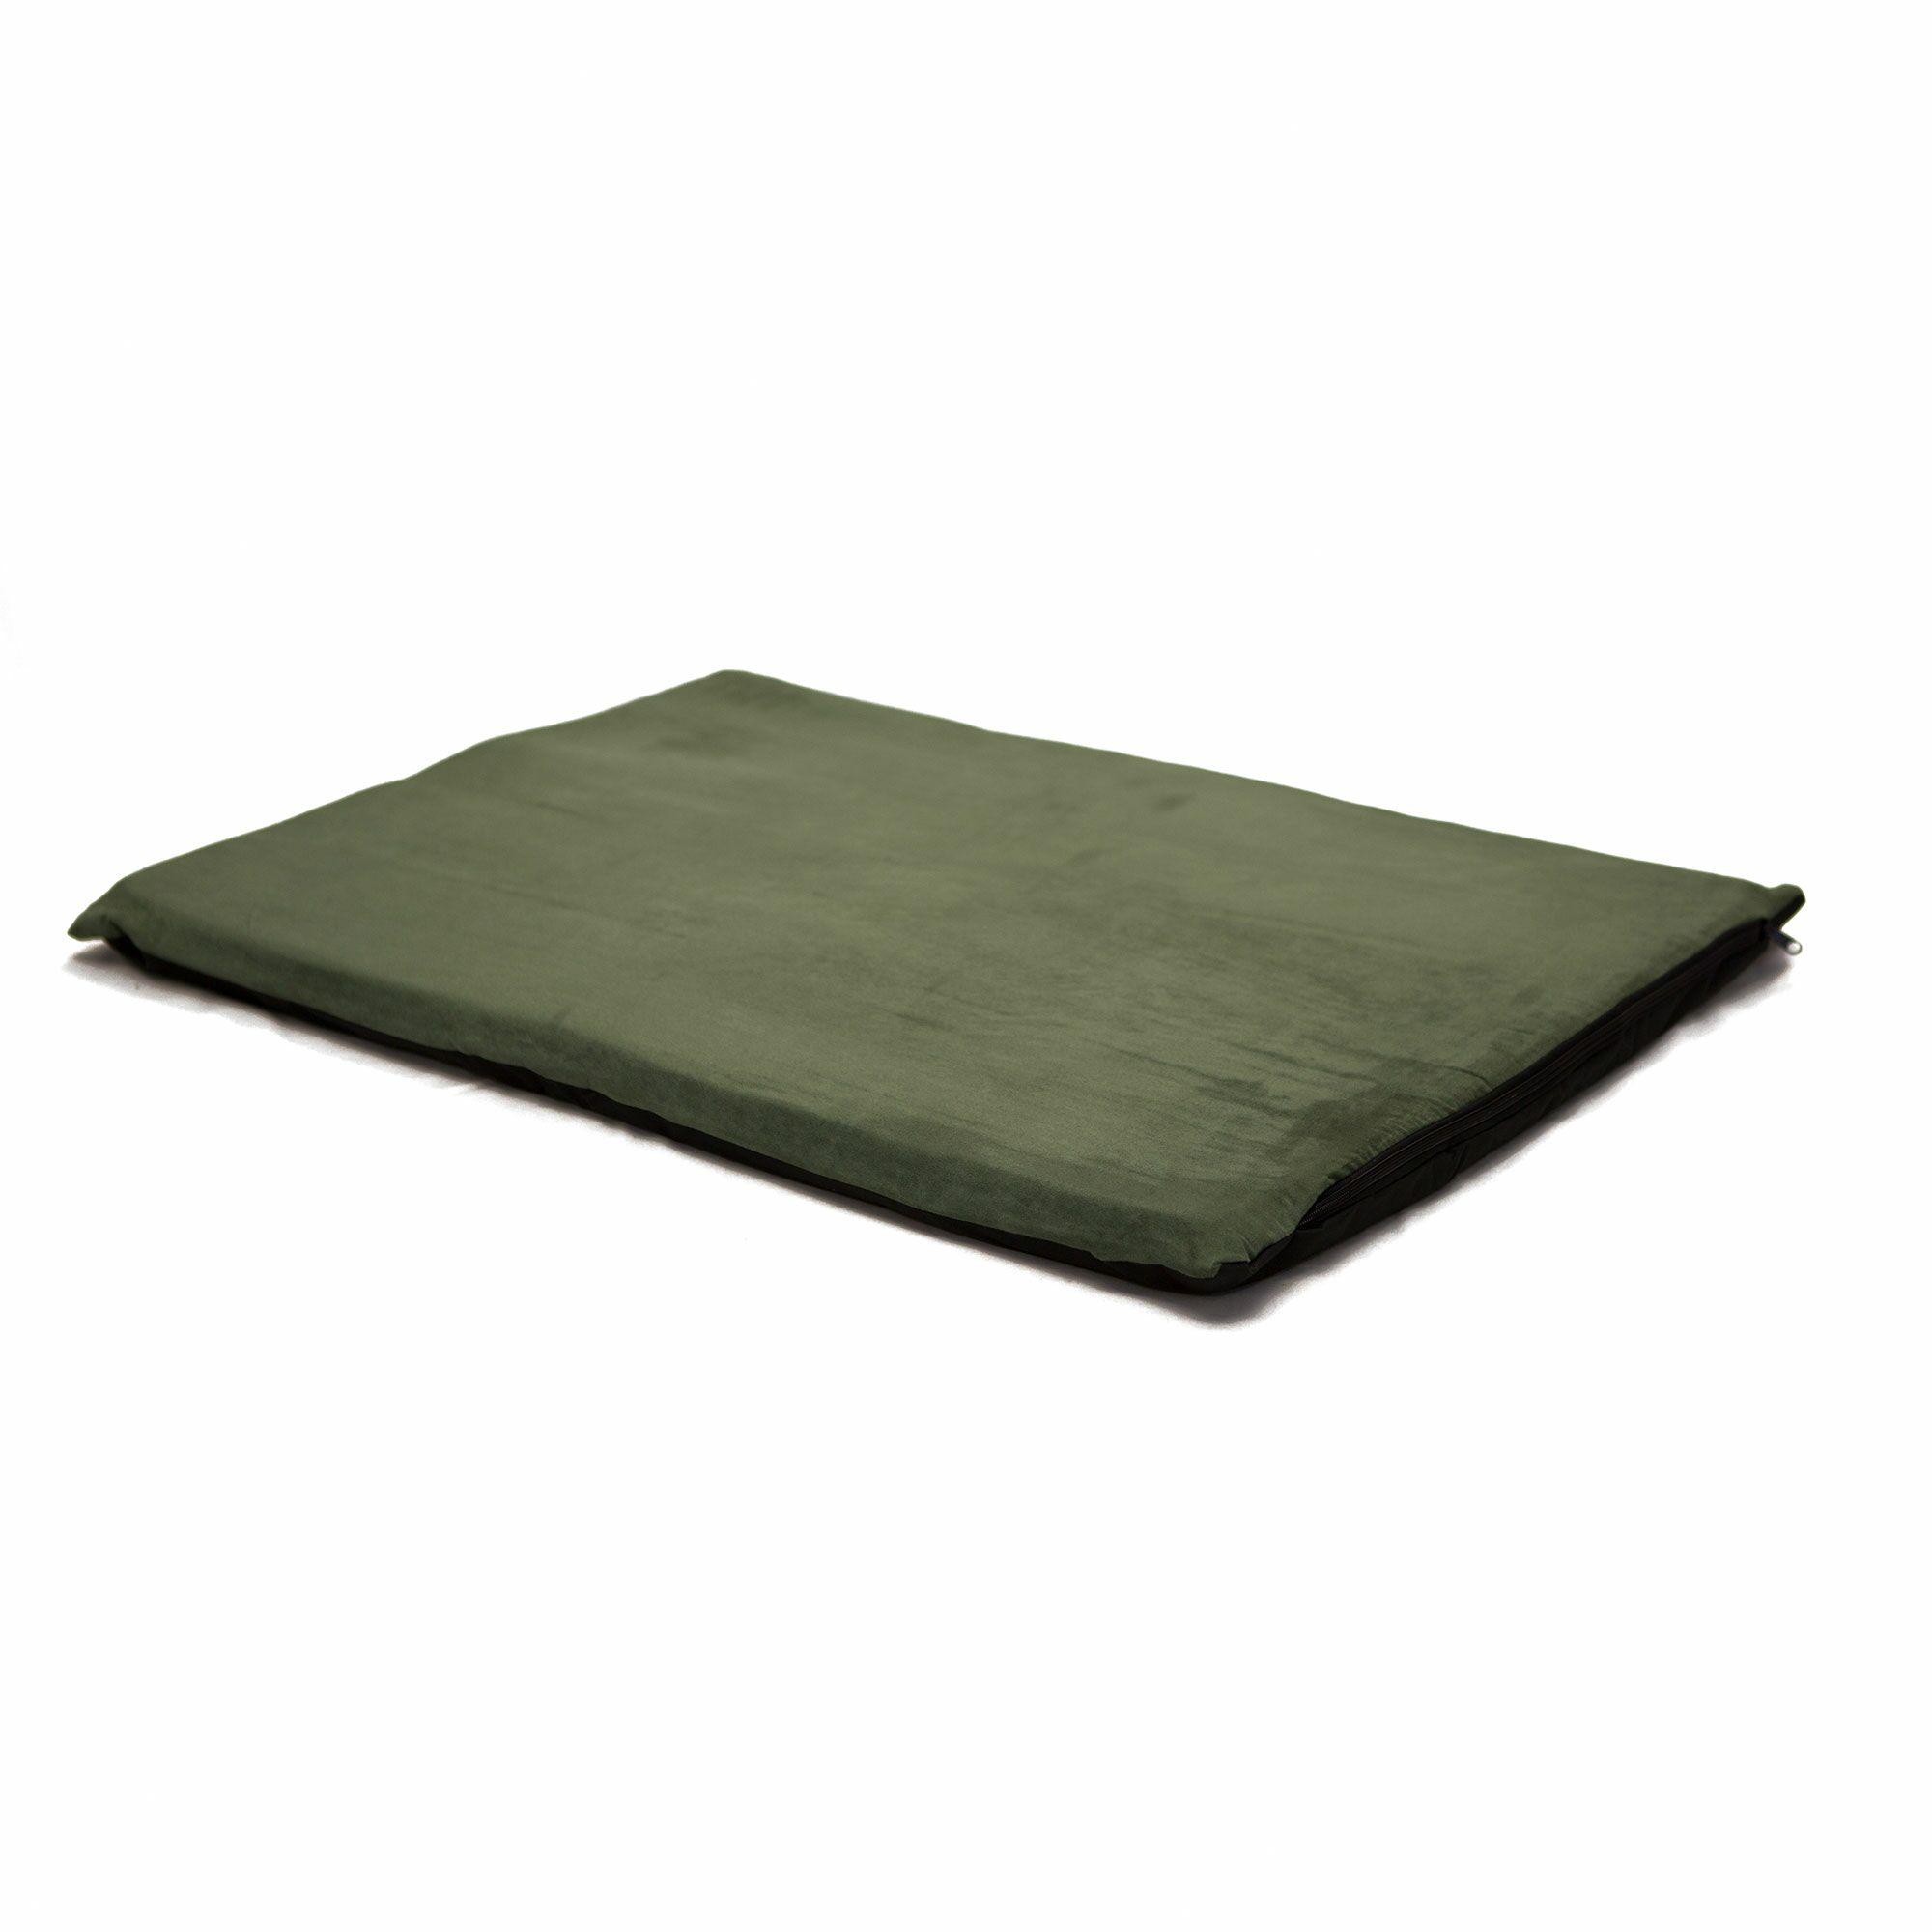 Orthopedic Foam Dog Mat Color: Forest, Size: Large (32